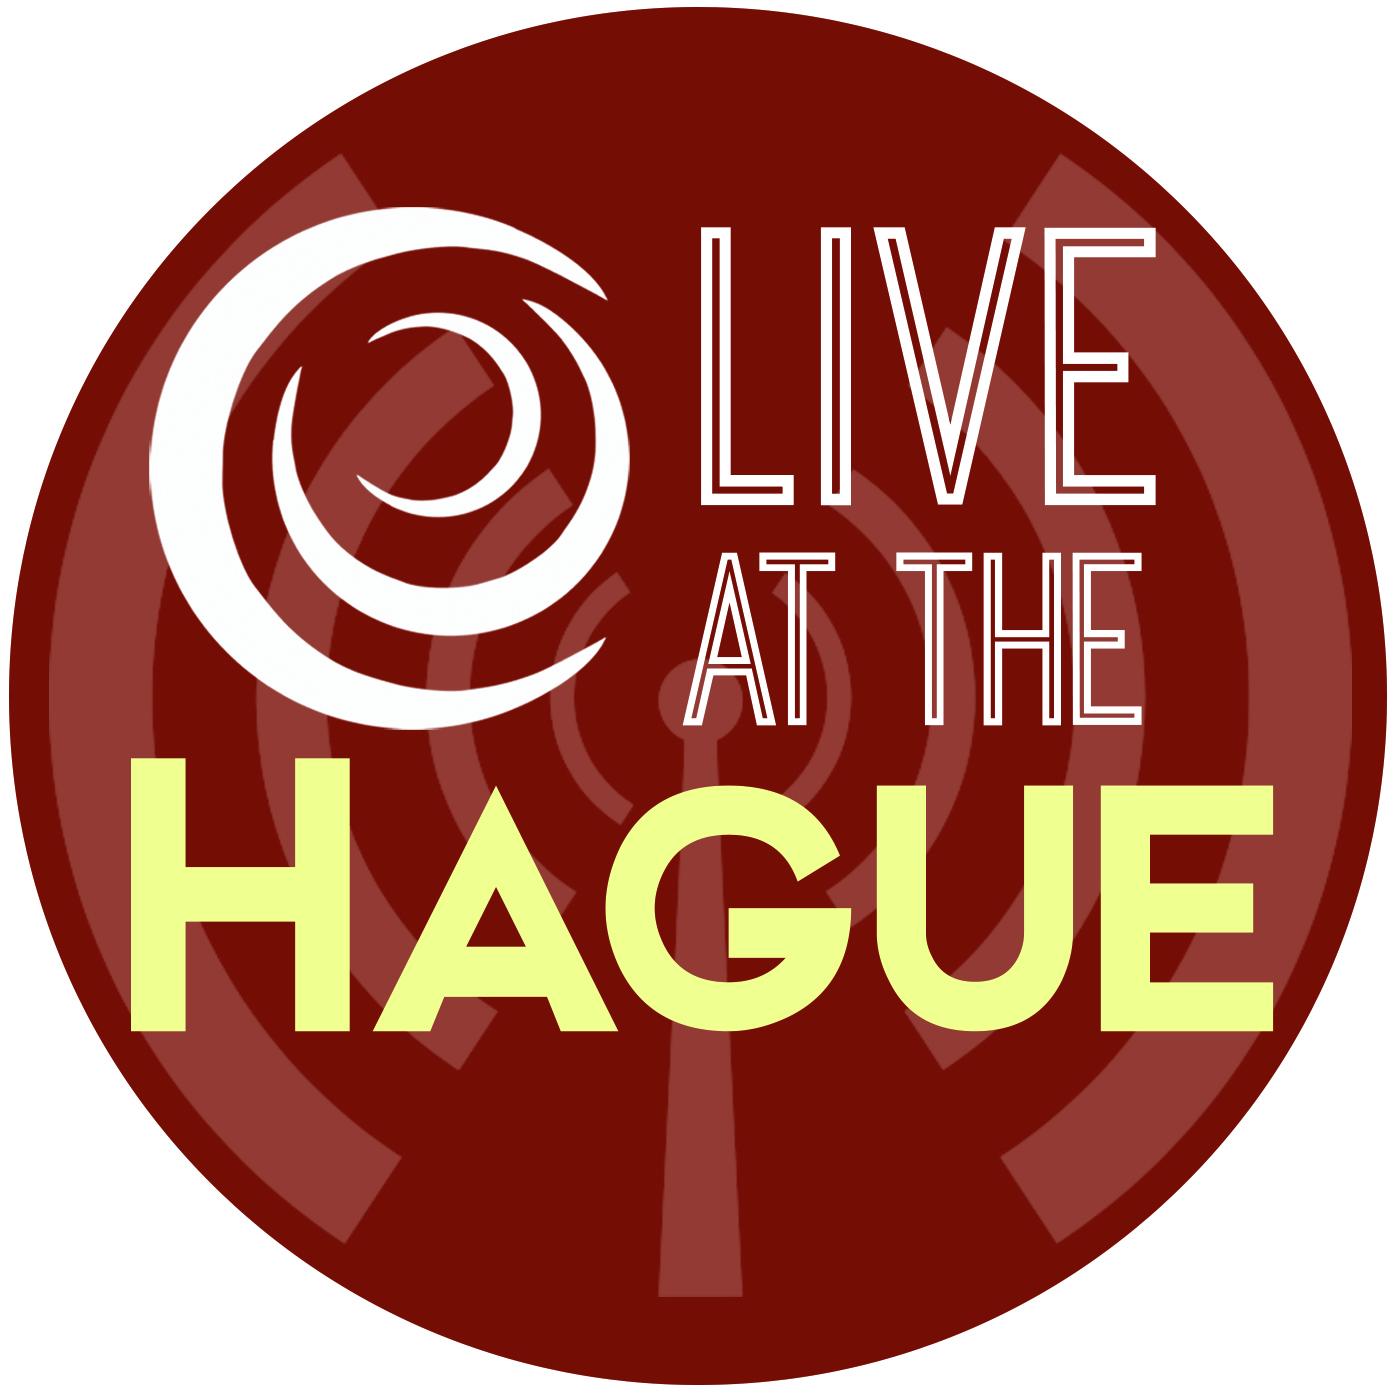 Live at the Hague